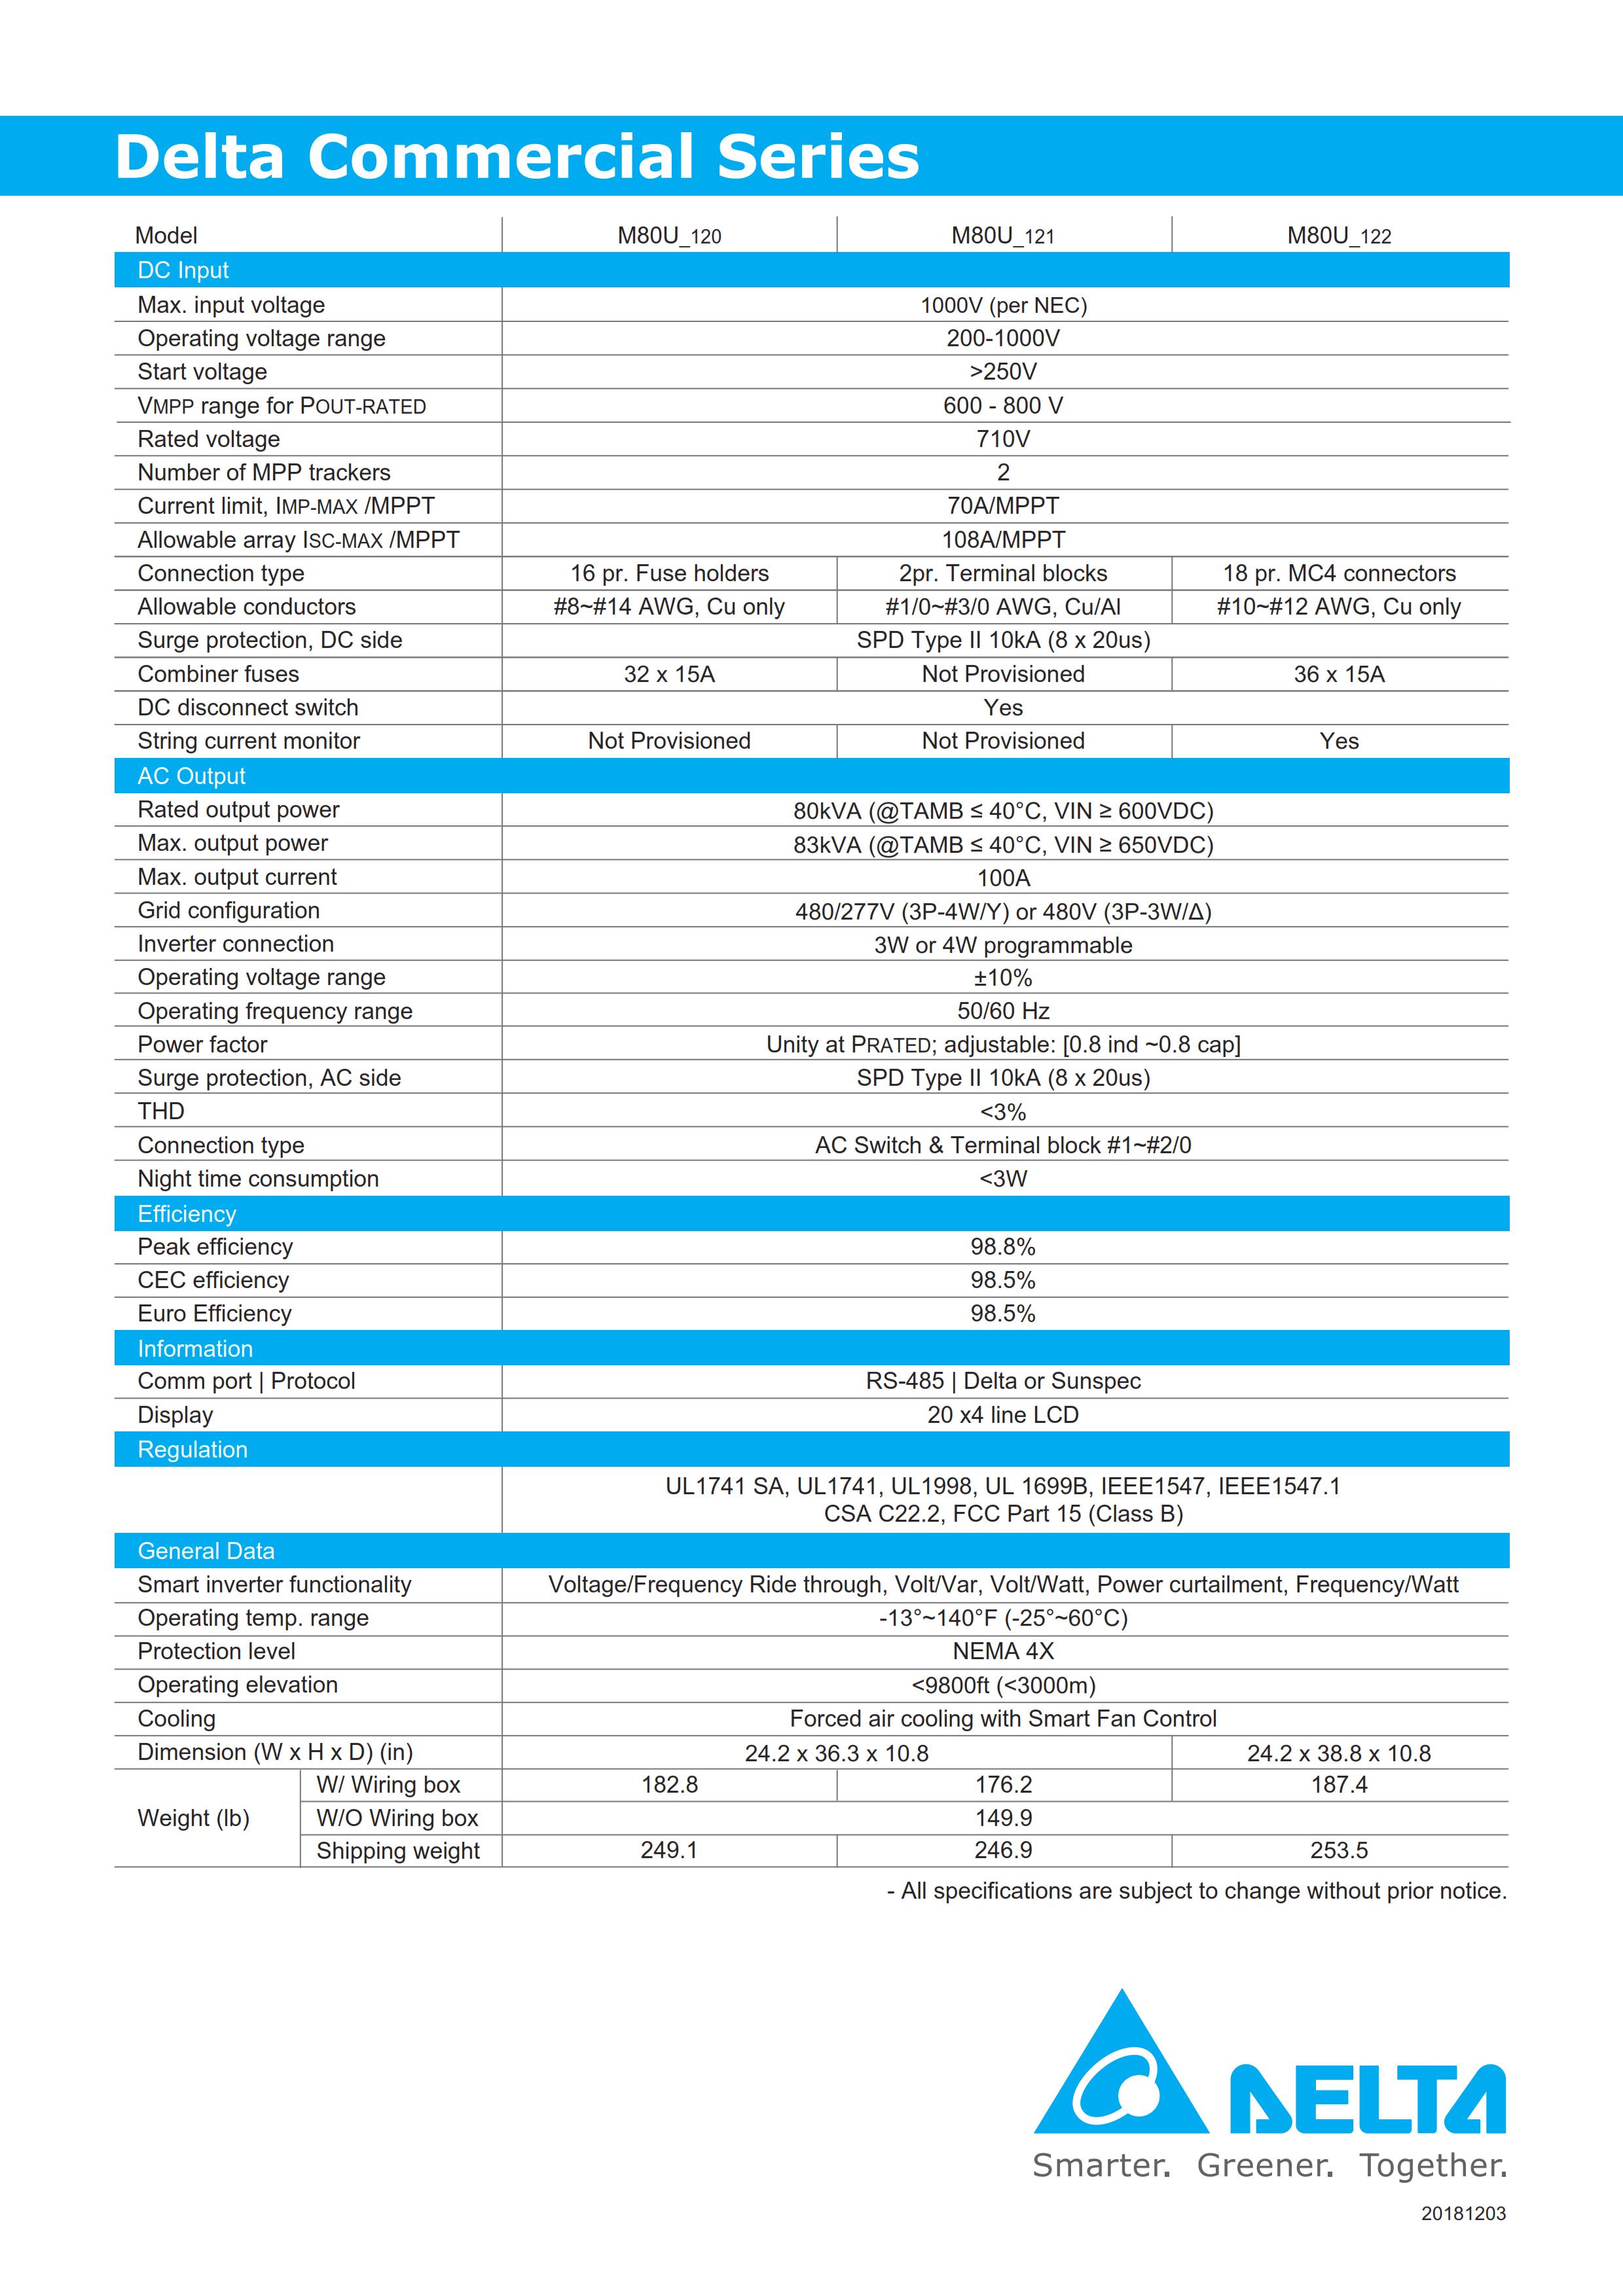 20181203-M80U spec_004